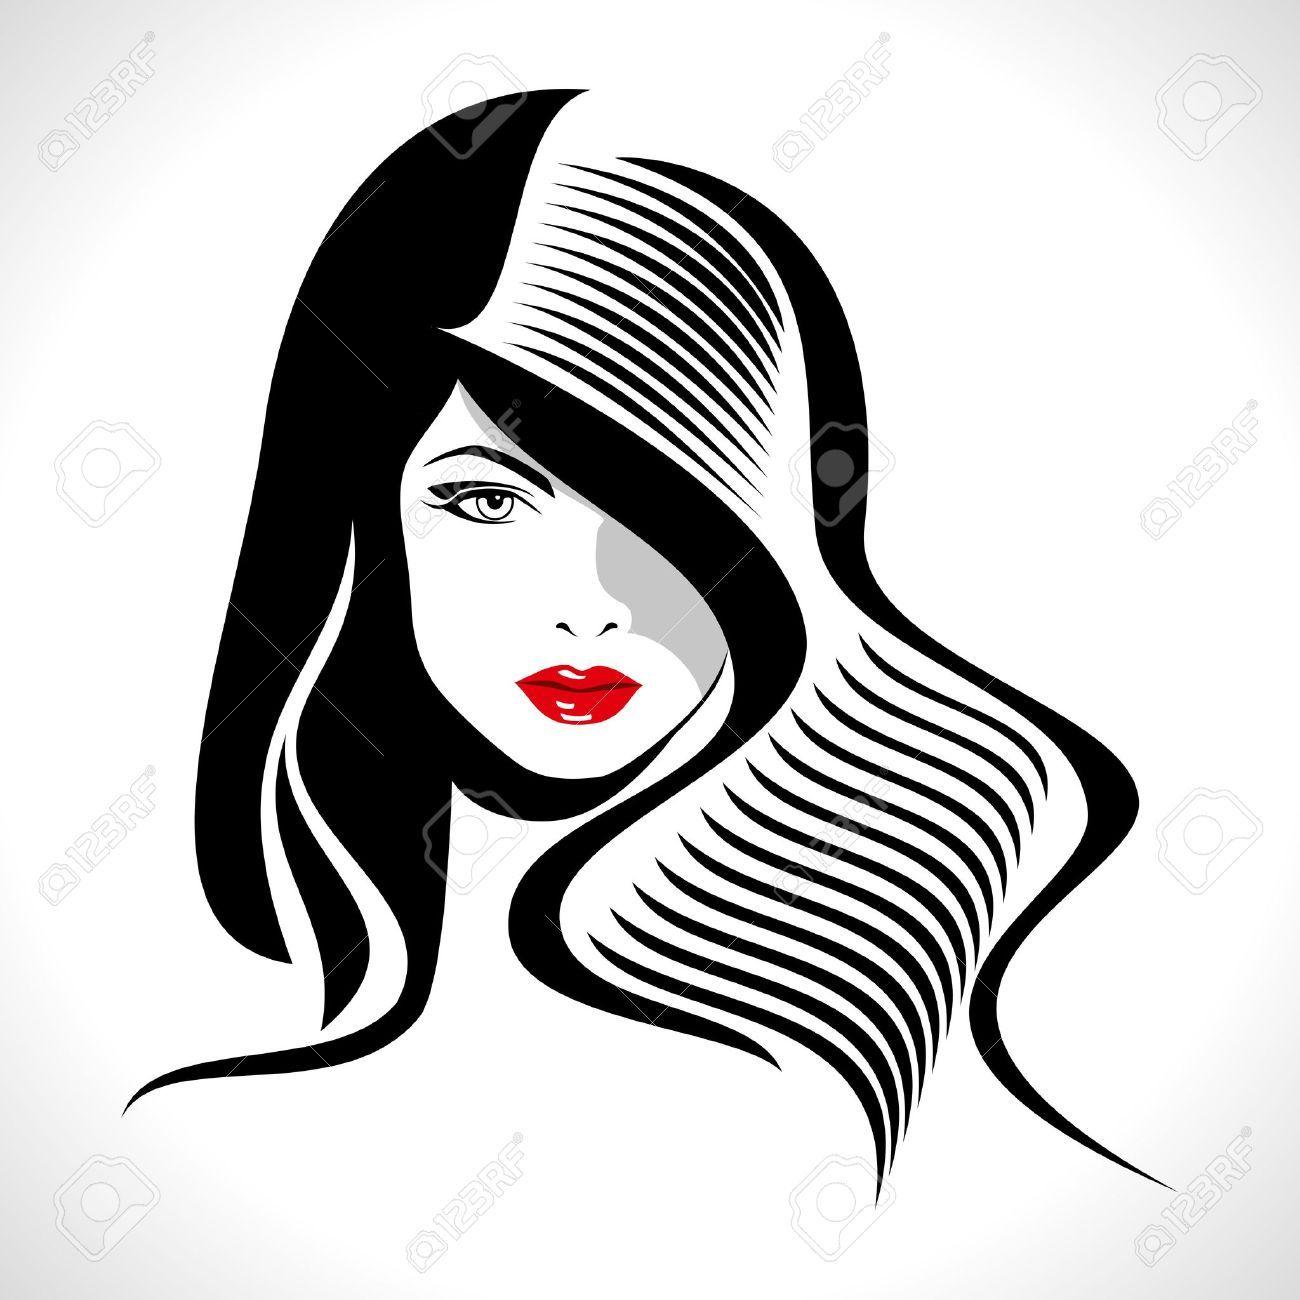 Silhouette Face Logo